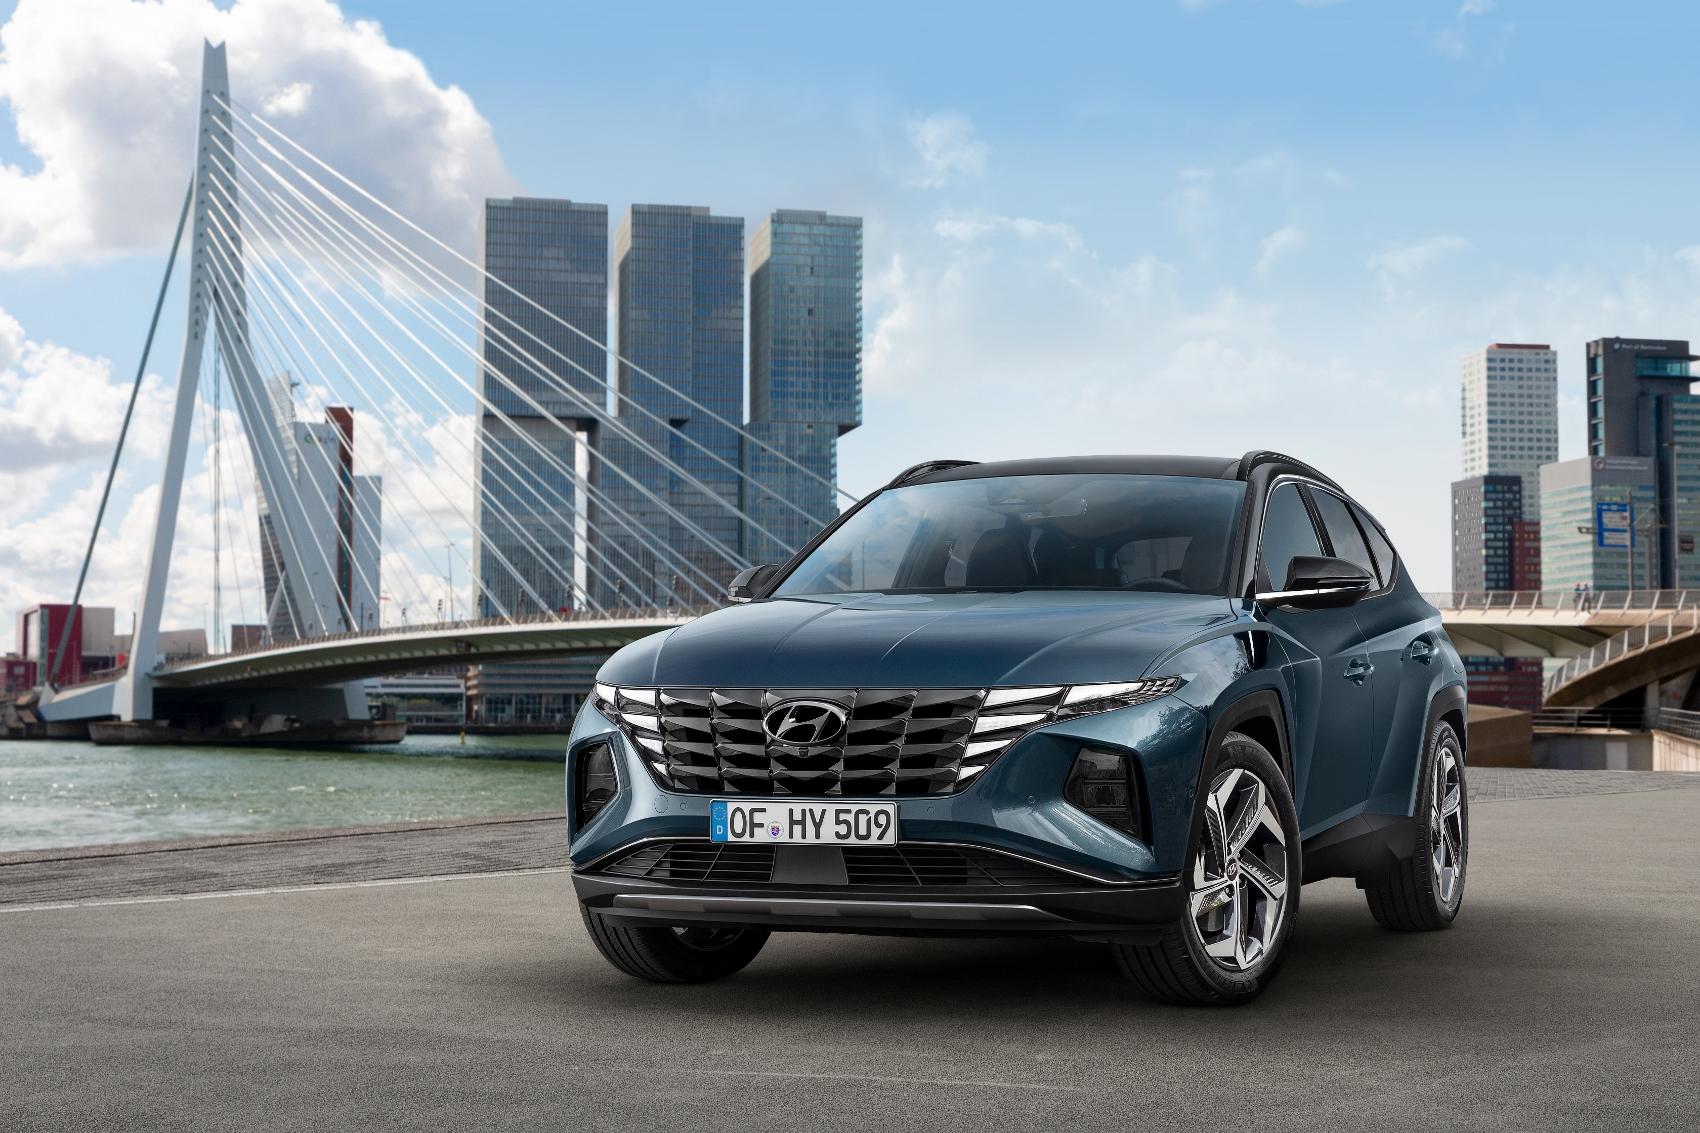 all-new Hyundai Tucson (1) (1700x1133)